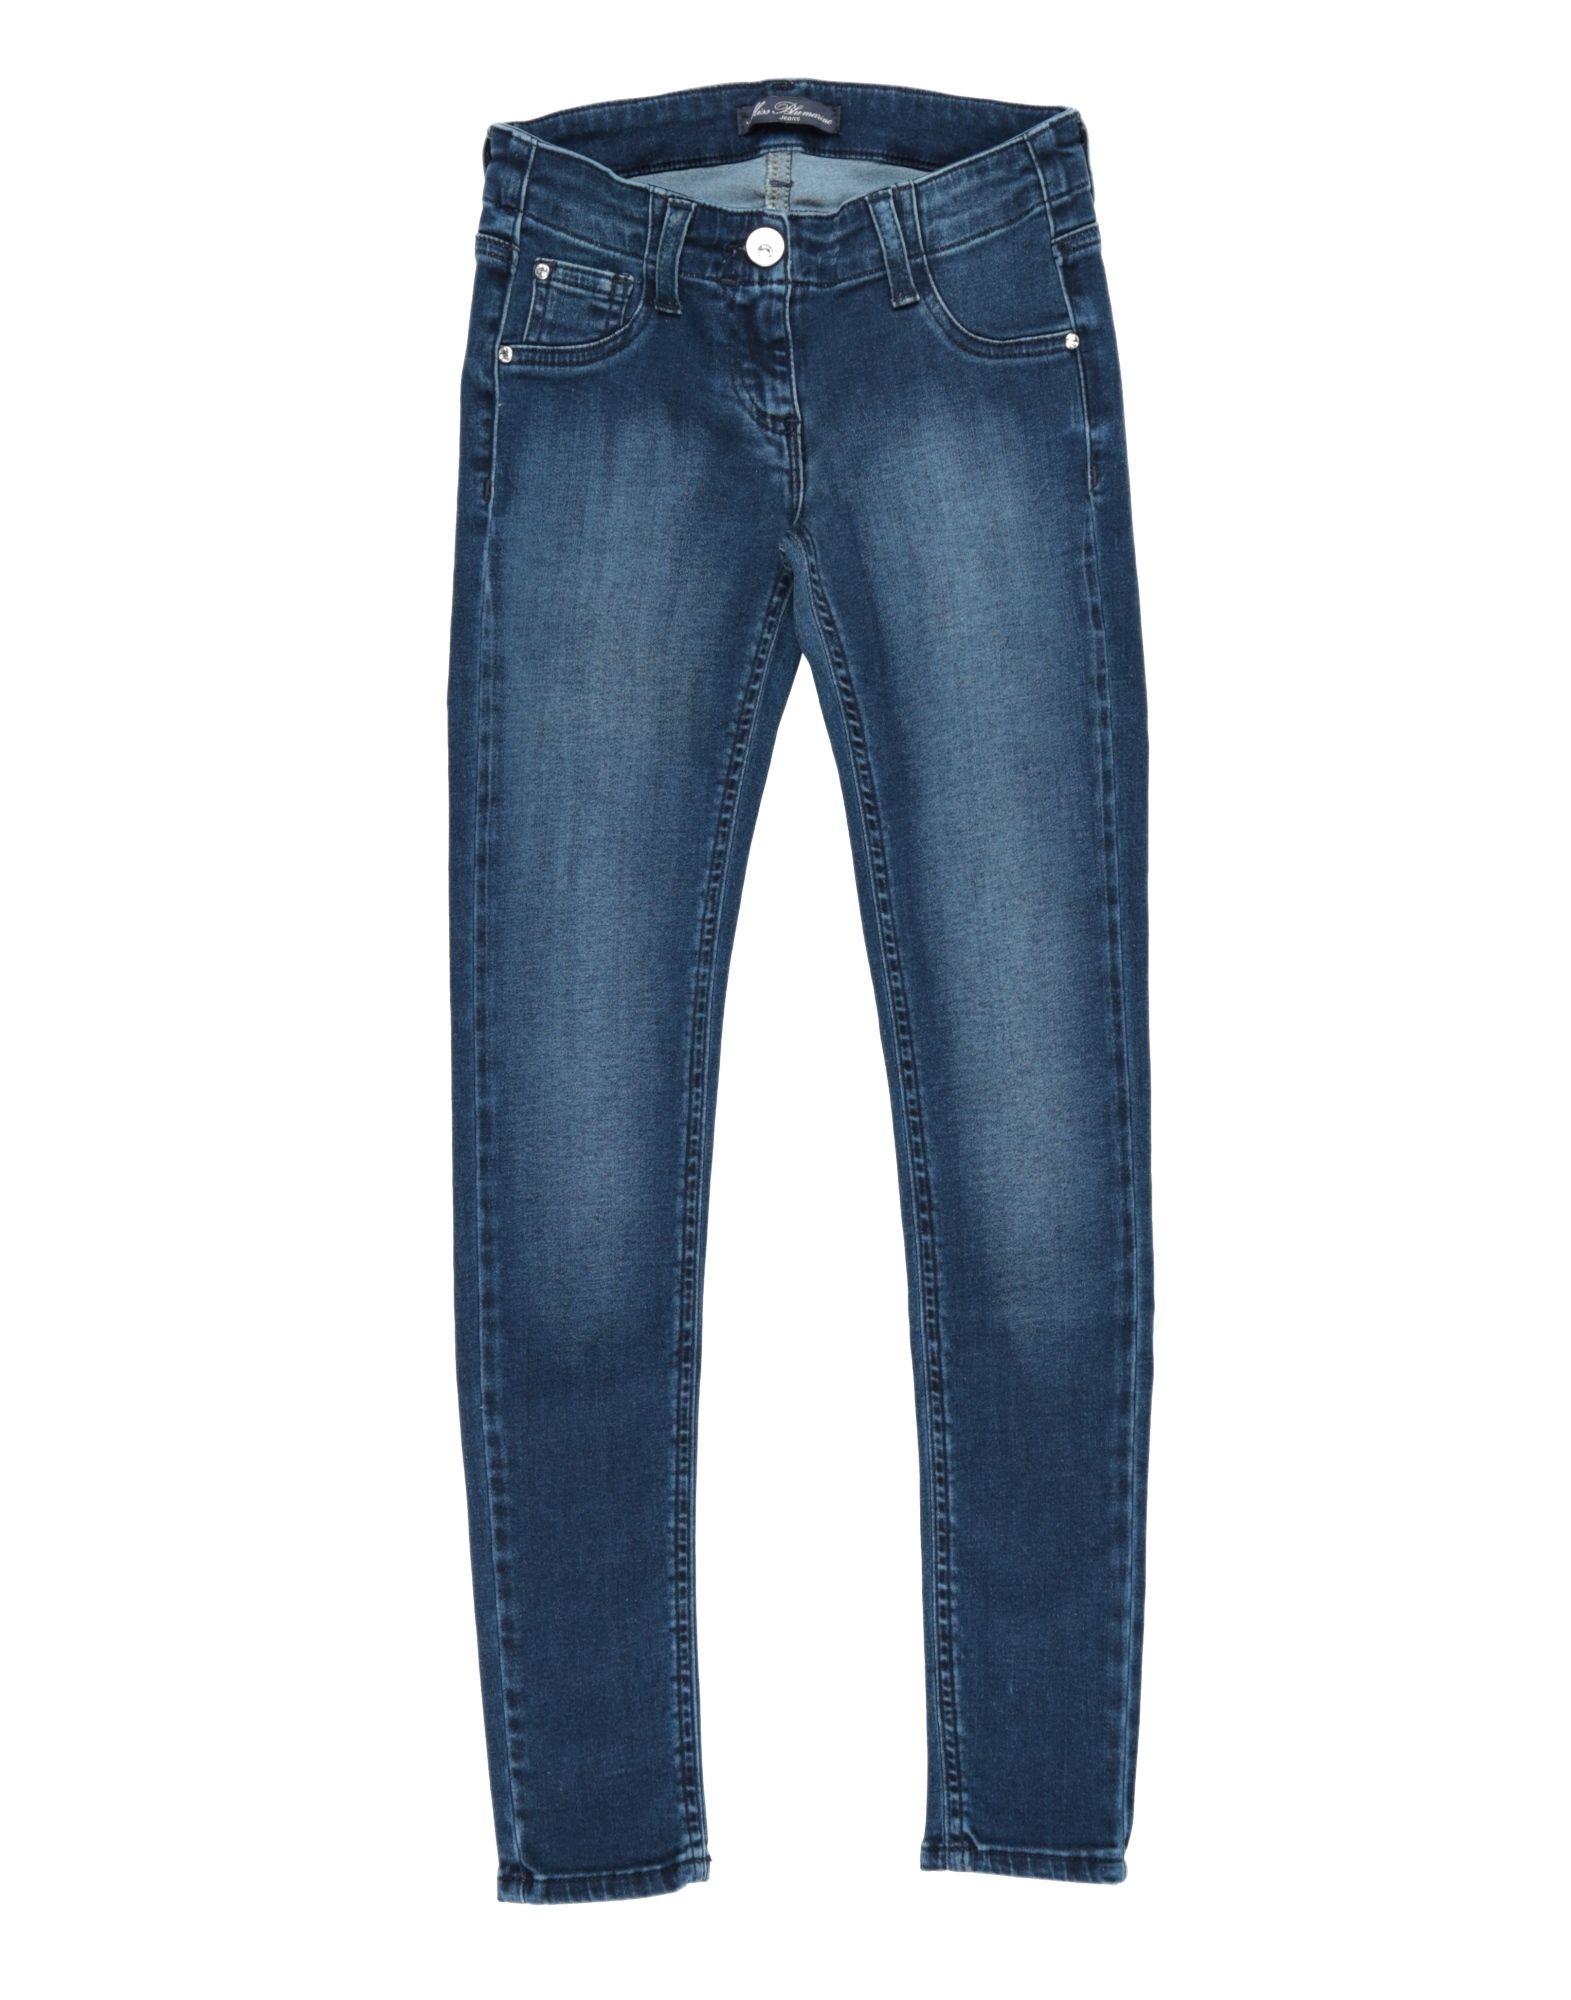 MISS BLUMARINE JEANS Джинсовые брюки